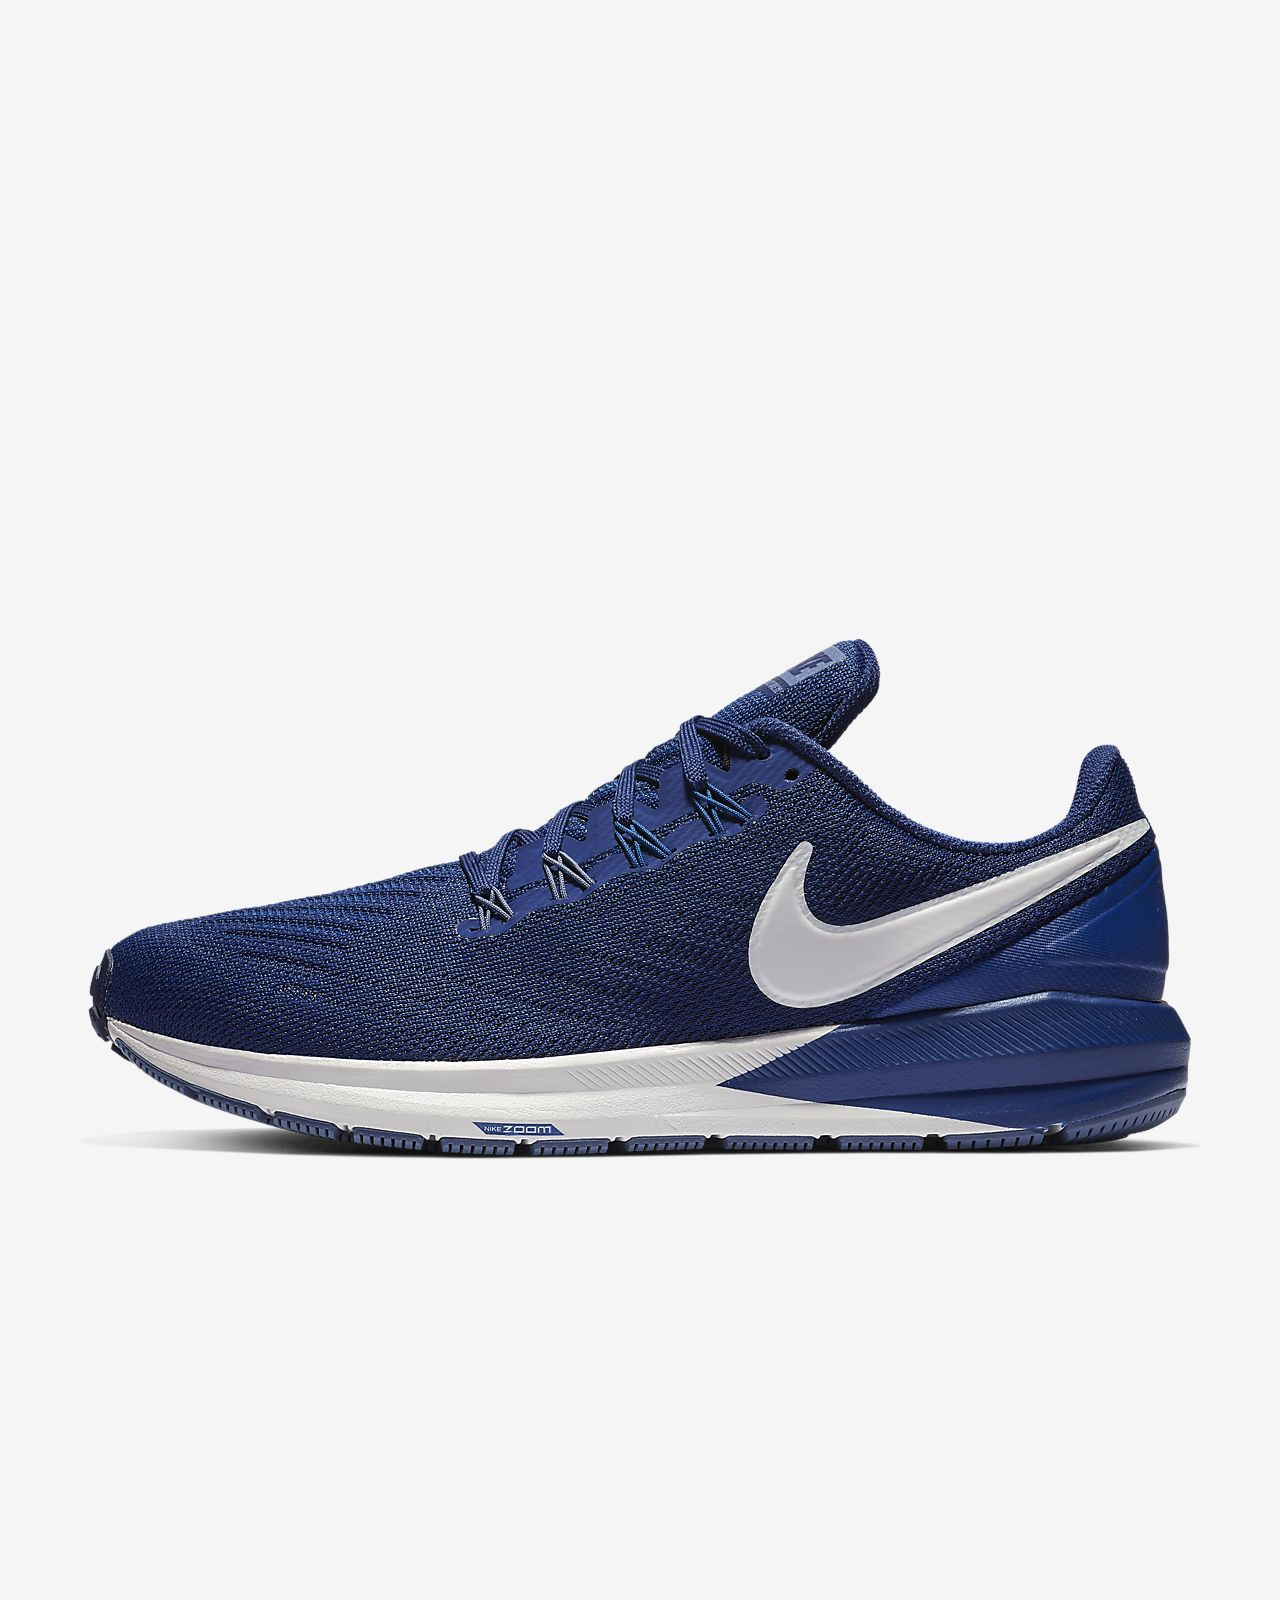 Calzado de running para hombre Nike Air Zoom Structure 22 (estrecho)